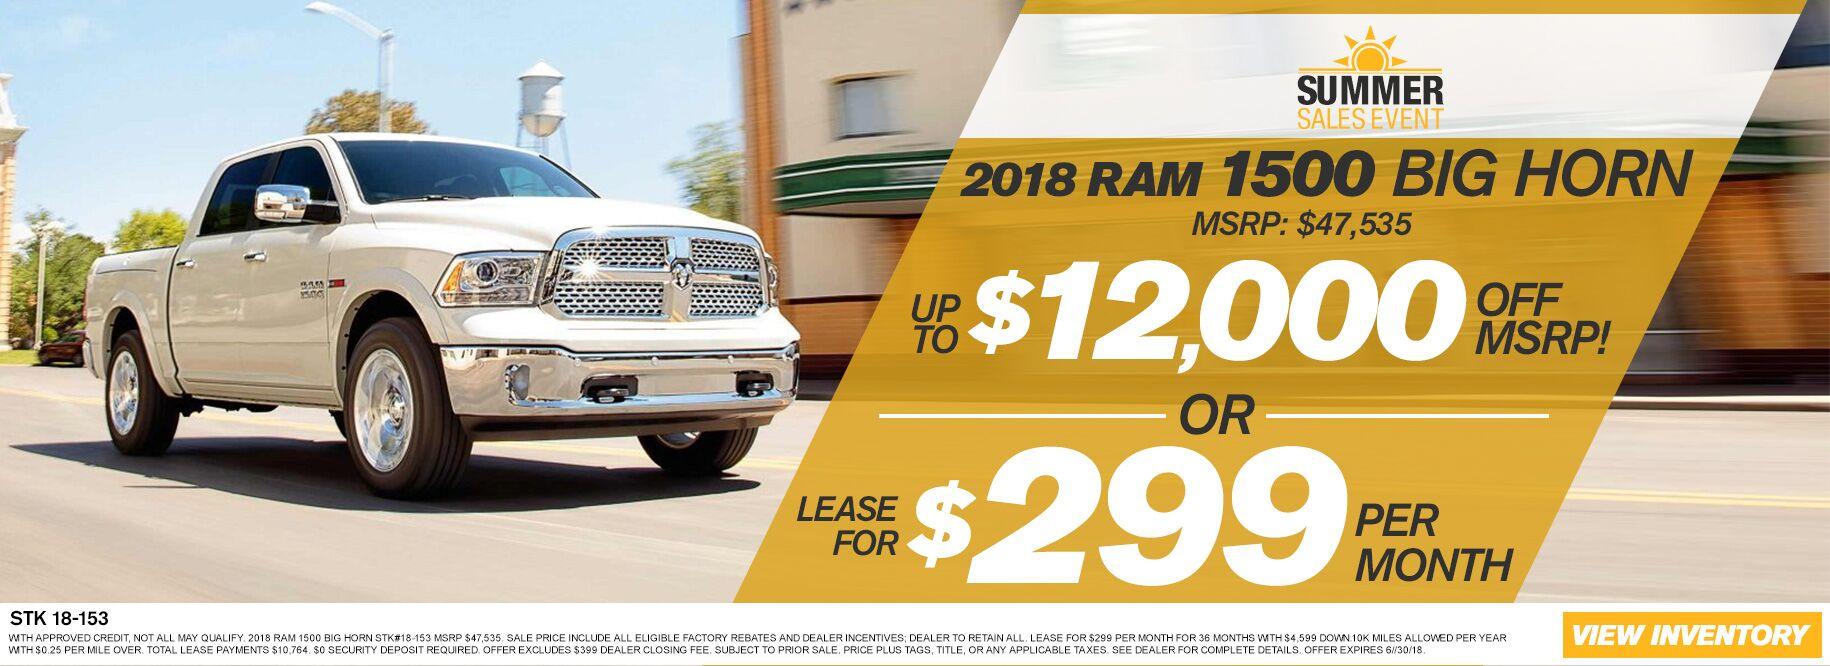 Parks Motors Augusta Ks >> Chevrolet Chrysler Dodge Jeep RAM Dealership Wichita KS | Used Cars Parks Motors